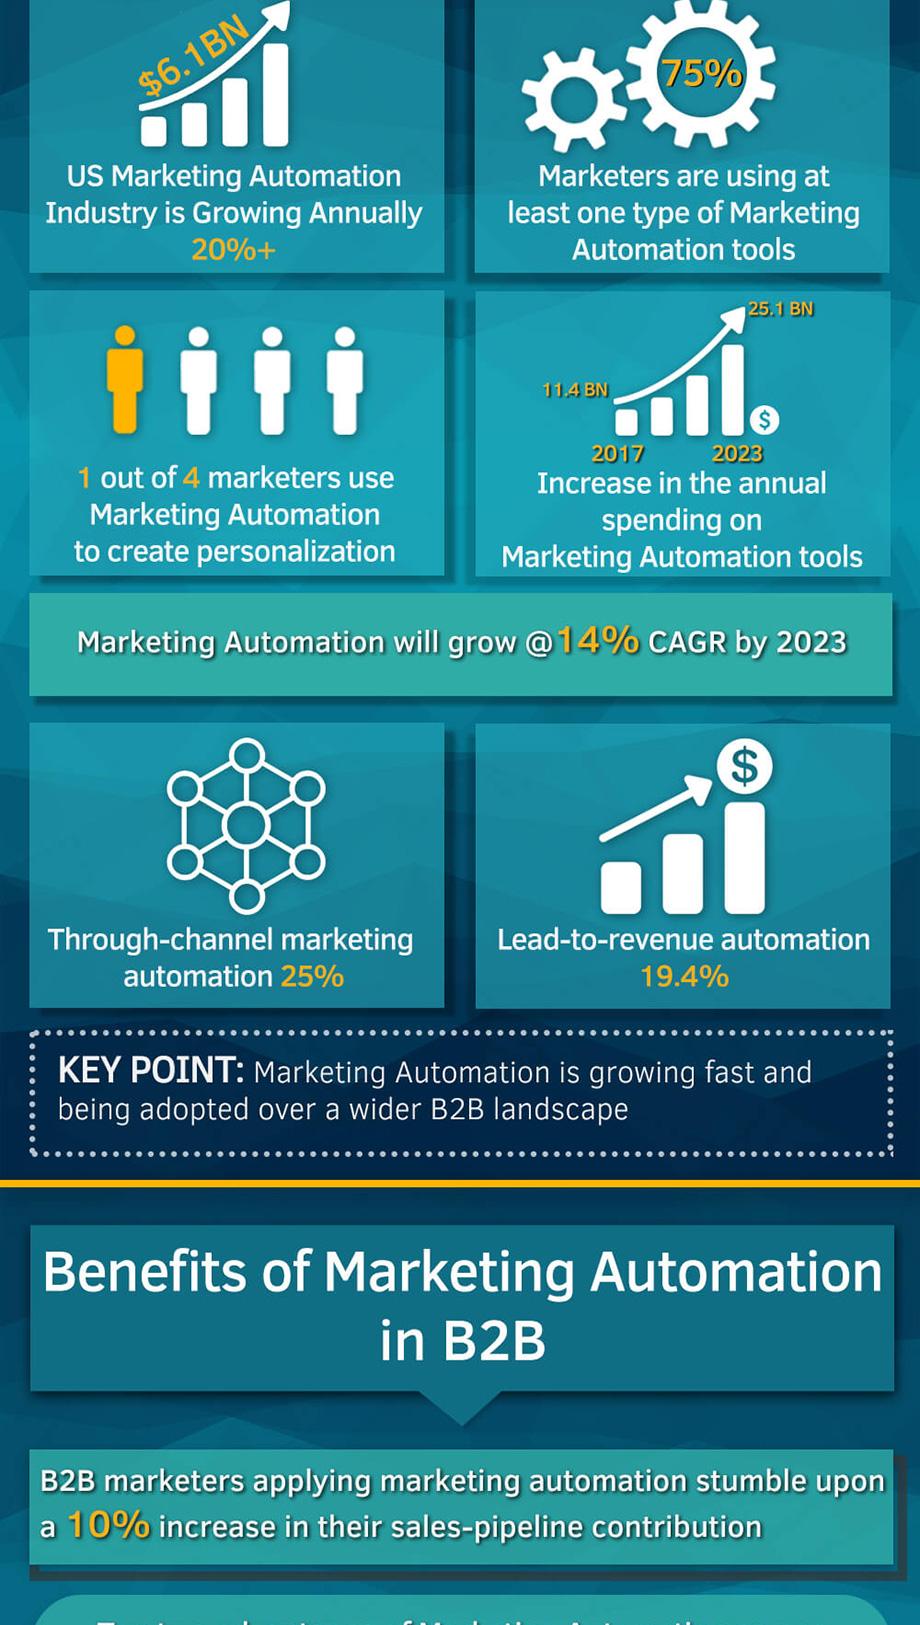 b2b-marketing-automation-role-infographic-2